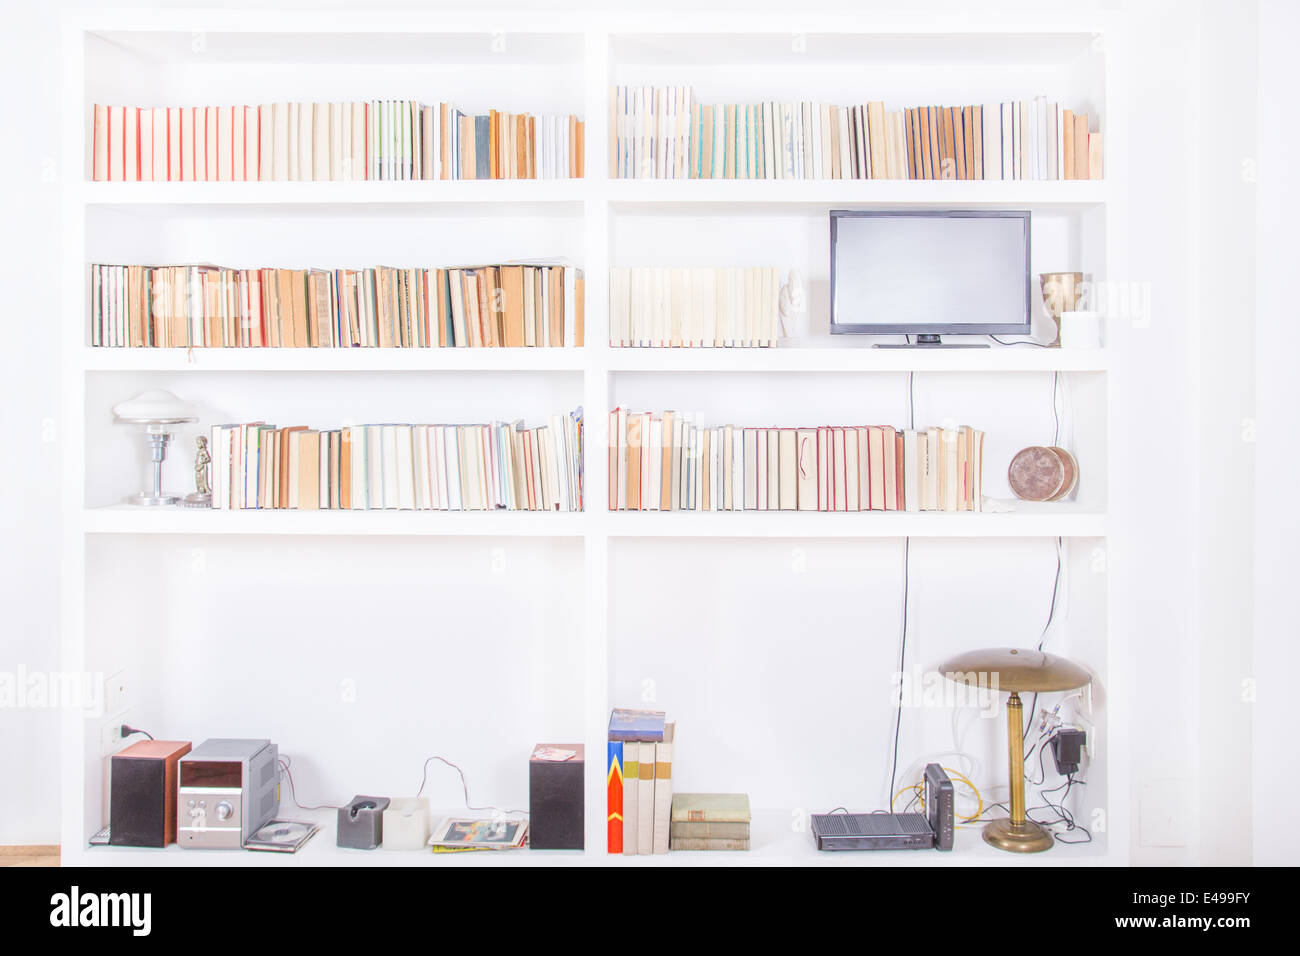 Bookshelf Books Living Room Stock Photos & Bookshelf Books Living ...